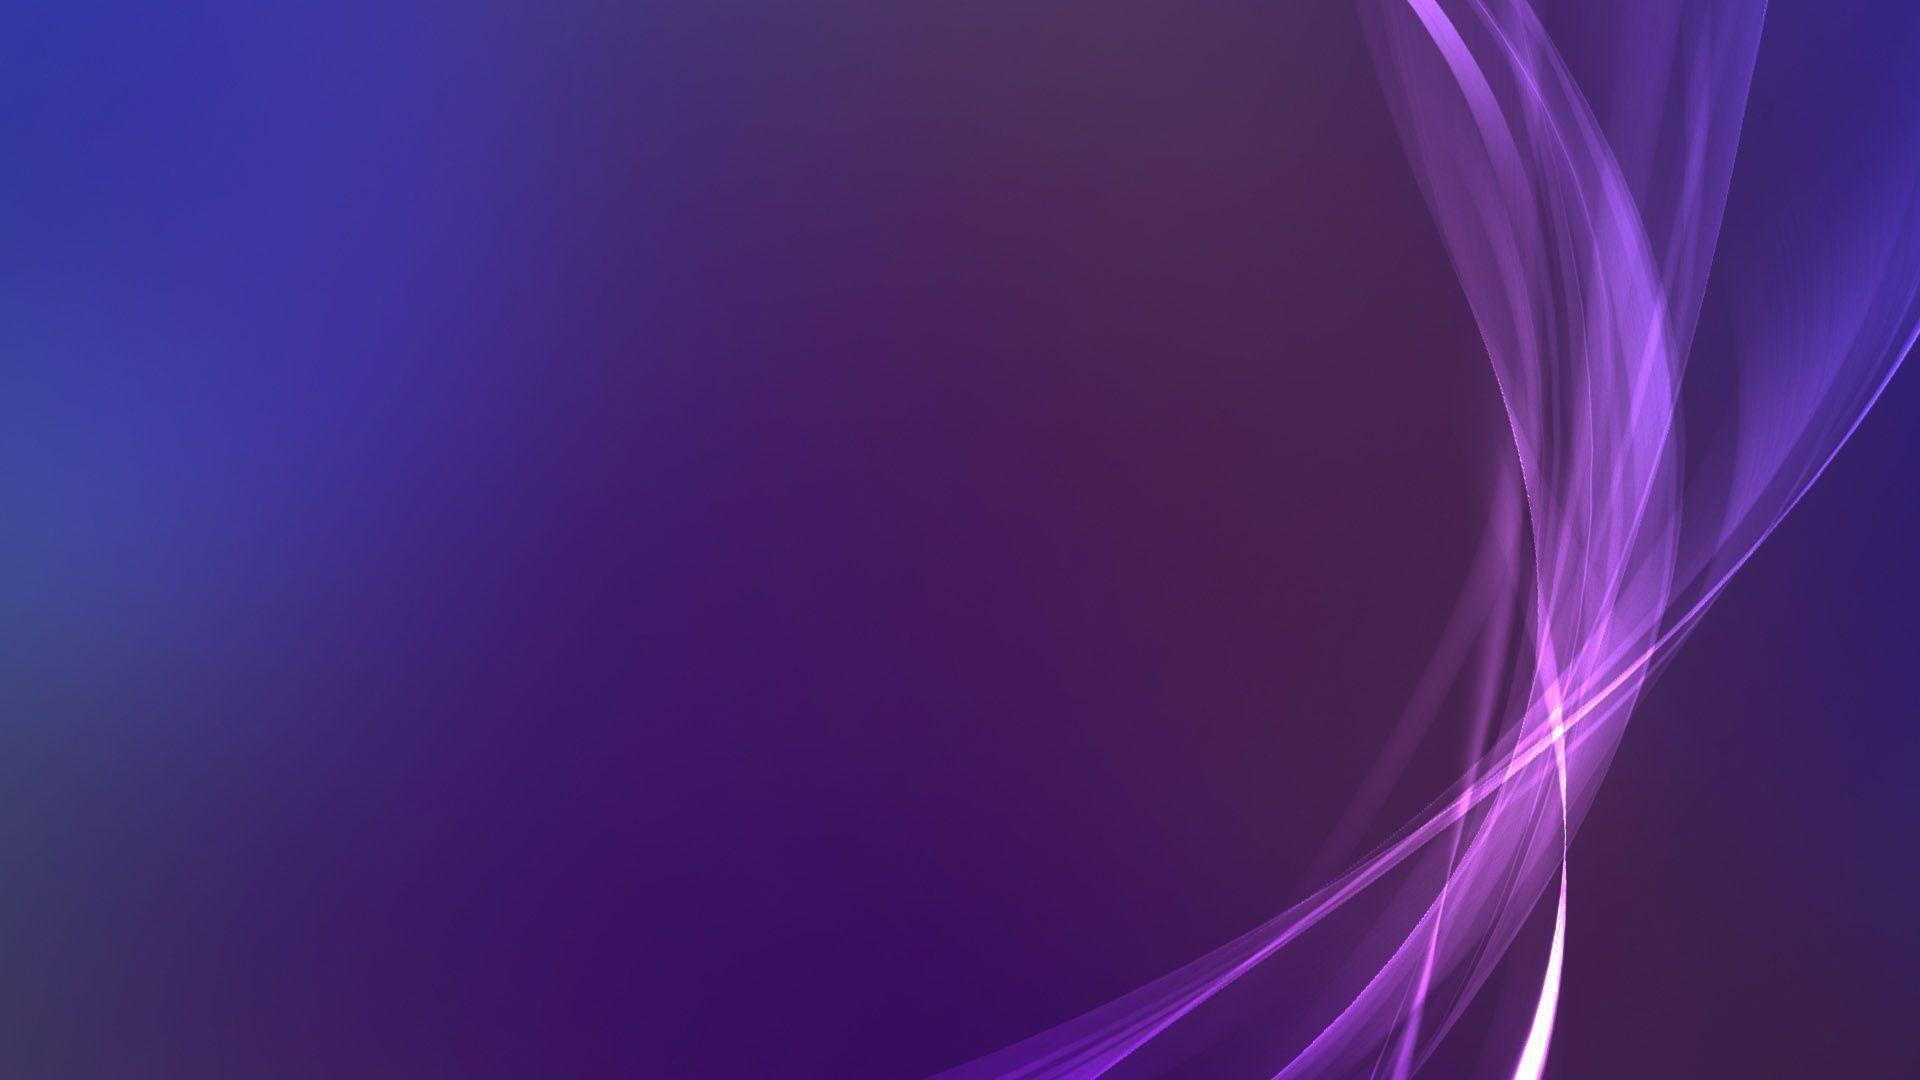 purple hd desktop wallpapers widescreen -#main